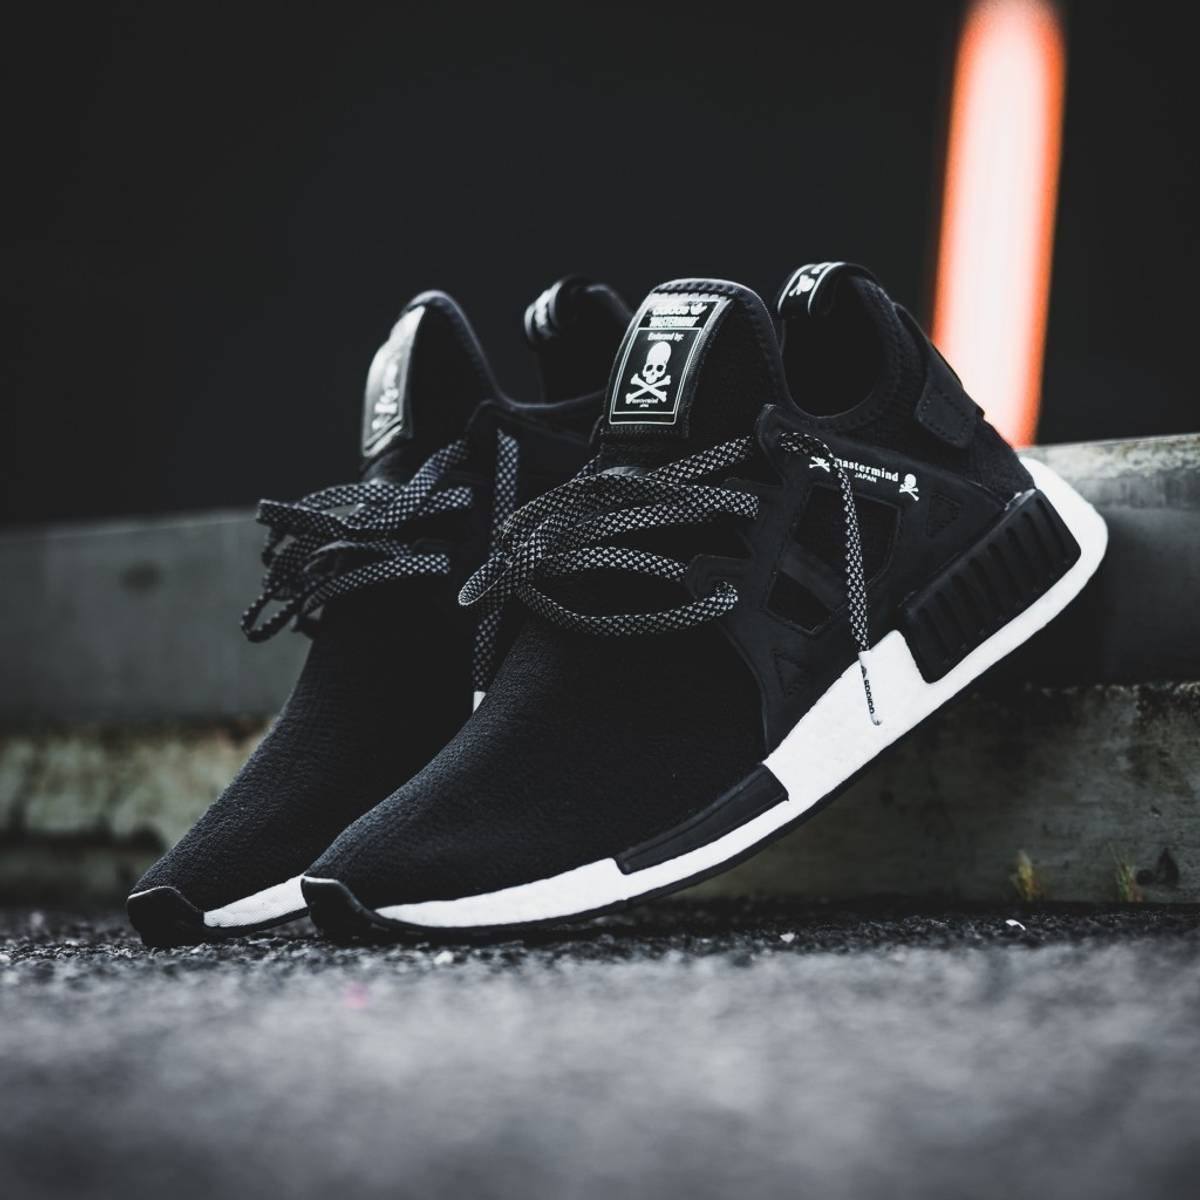 size 40 24901 8e5f1 Adidas × Mastermind Japan × Yeezy Boost Adidas Nmd X Mastermind Size 9 Size  9 $429